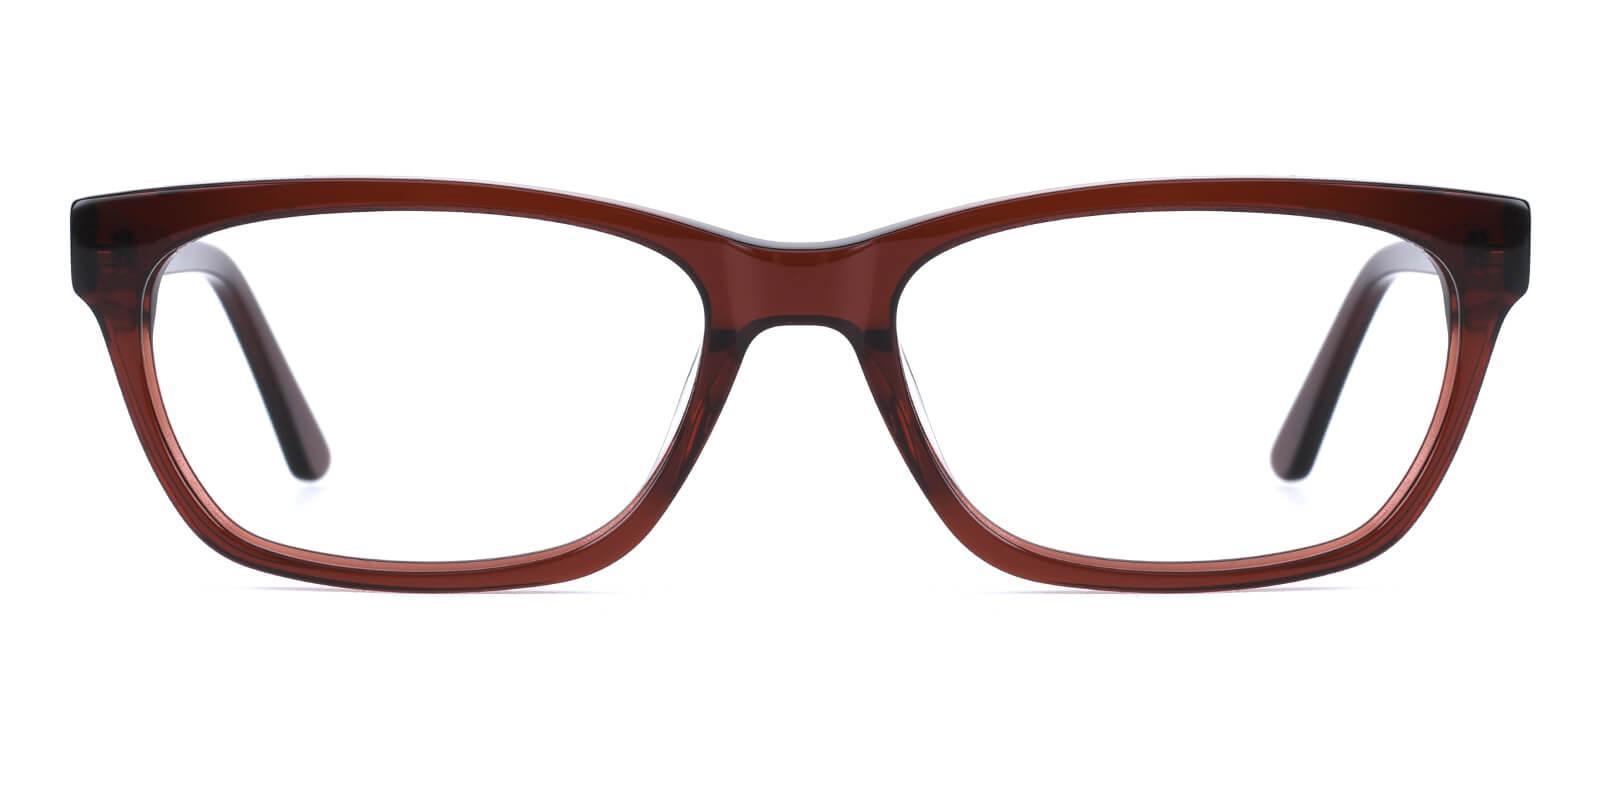 Mizura-Brown-Cat-Acetate-Eyeglasses-additional2